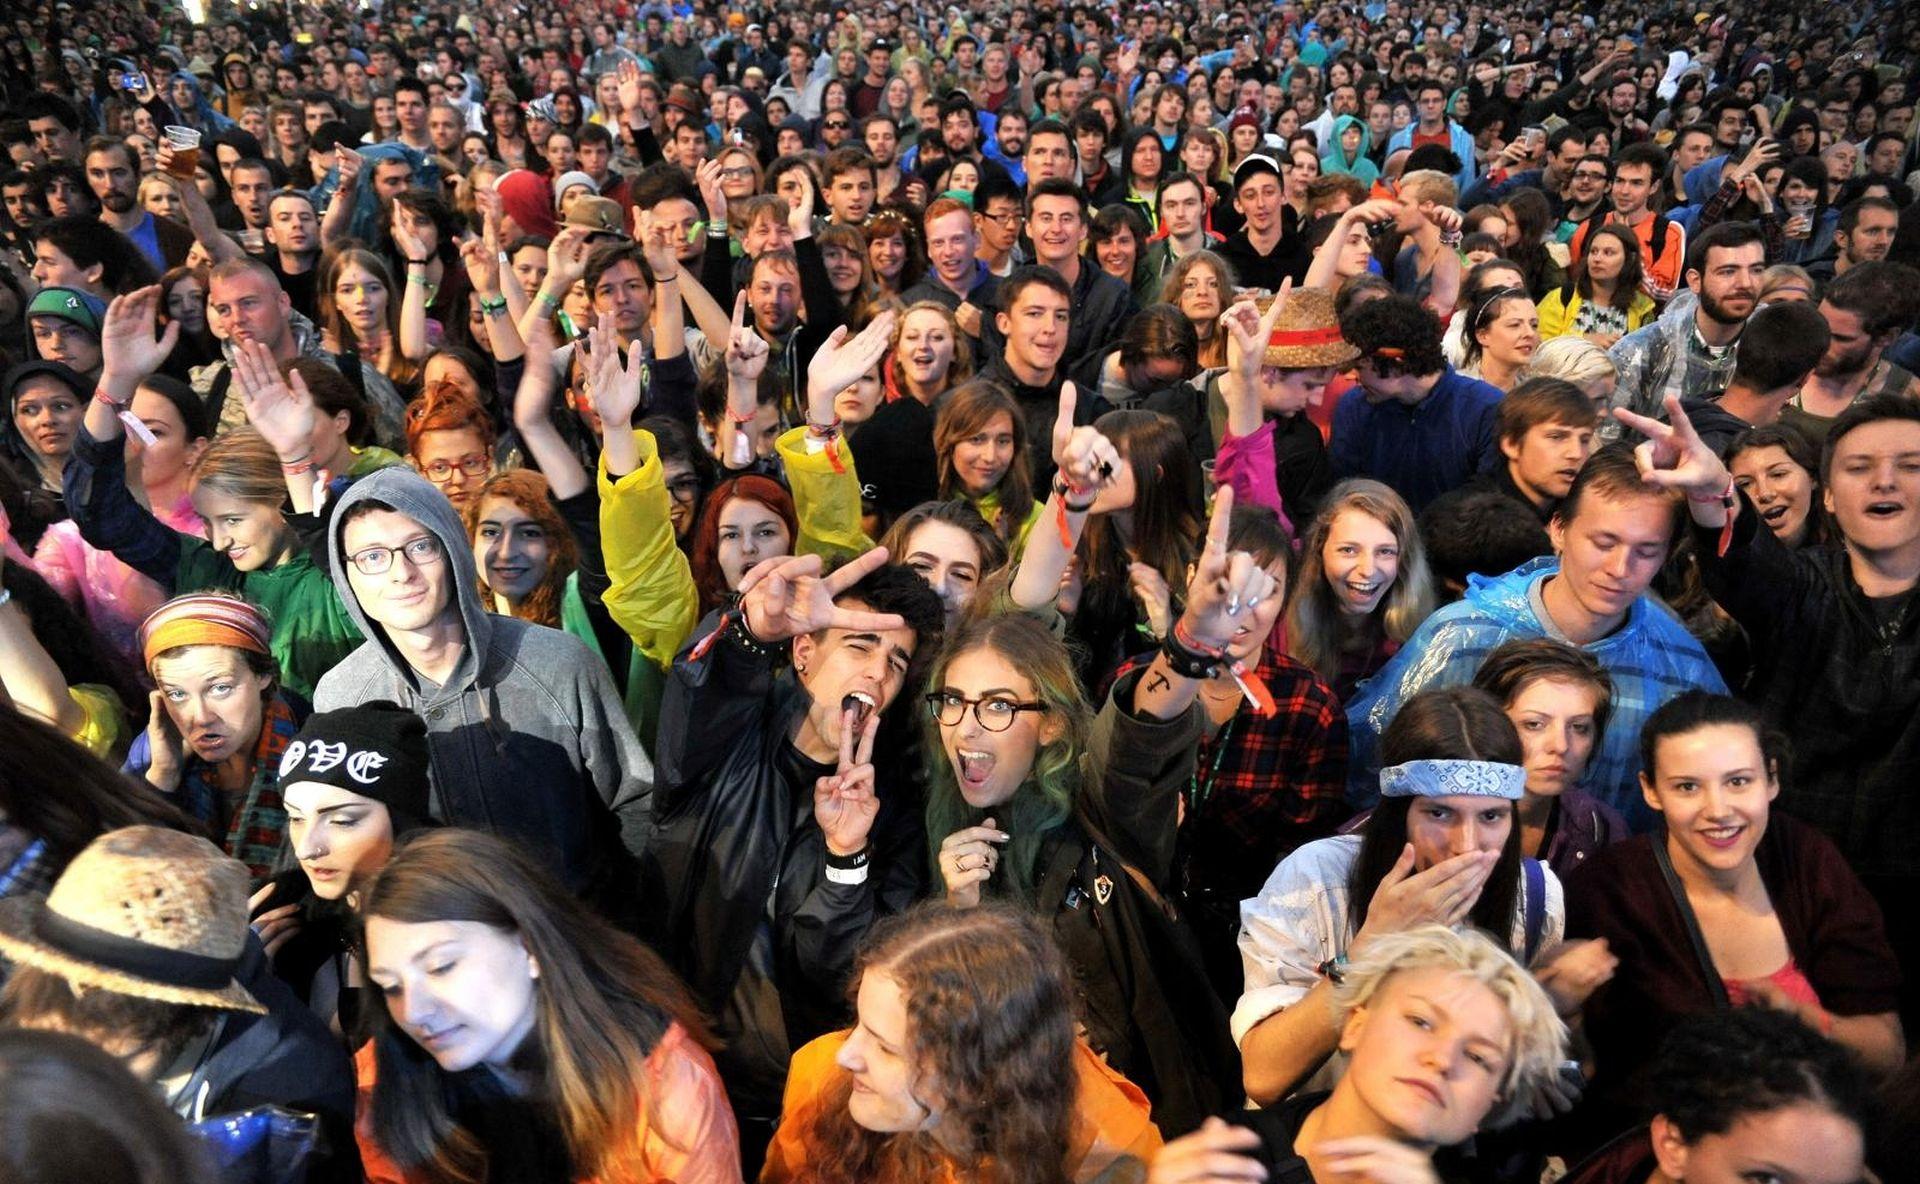 Prvi hrvatski nastup američke grupe Garbage na INmusic festivalu